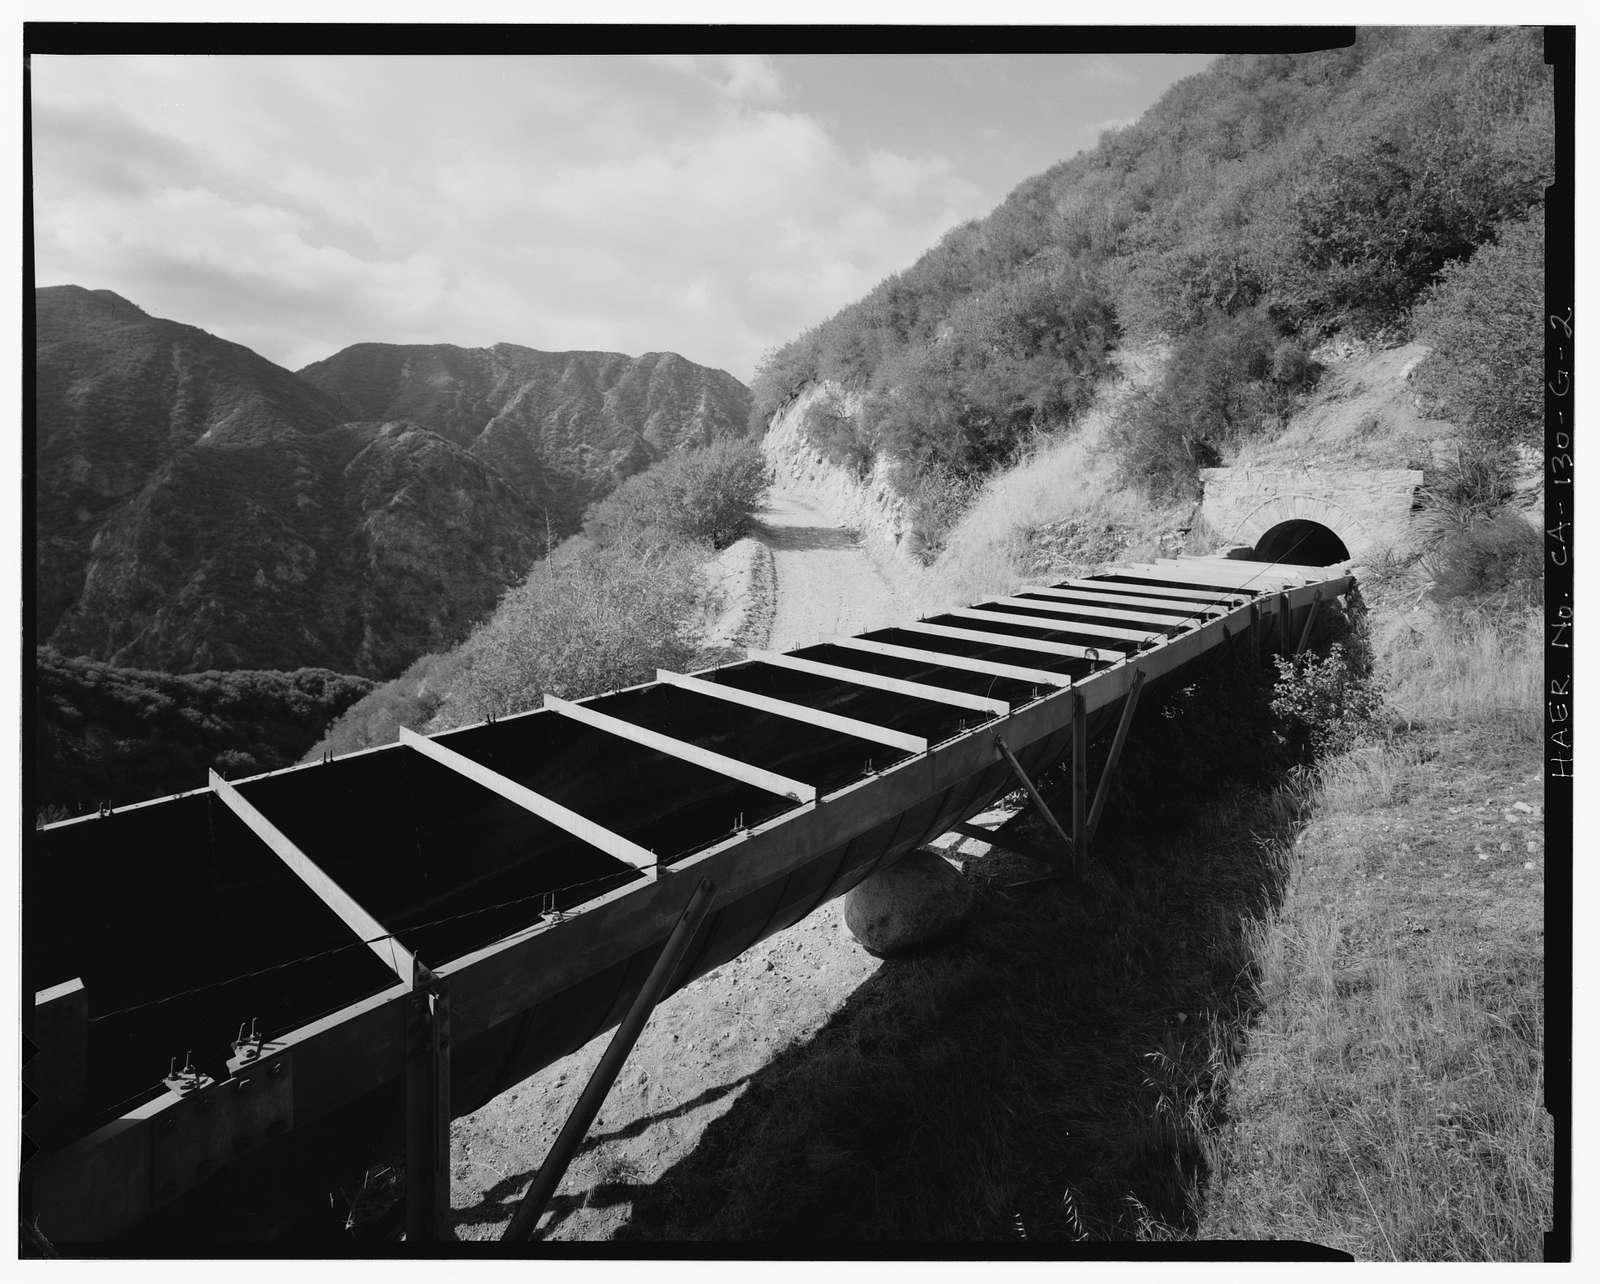 Santa Ana River Hydroelectric System, Flumes & Tunnels below Sandbox, Redlands, San Bernardino County, CA